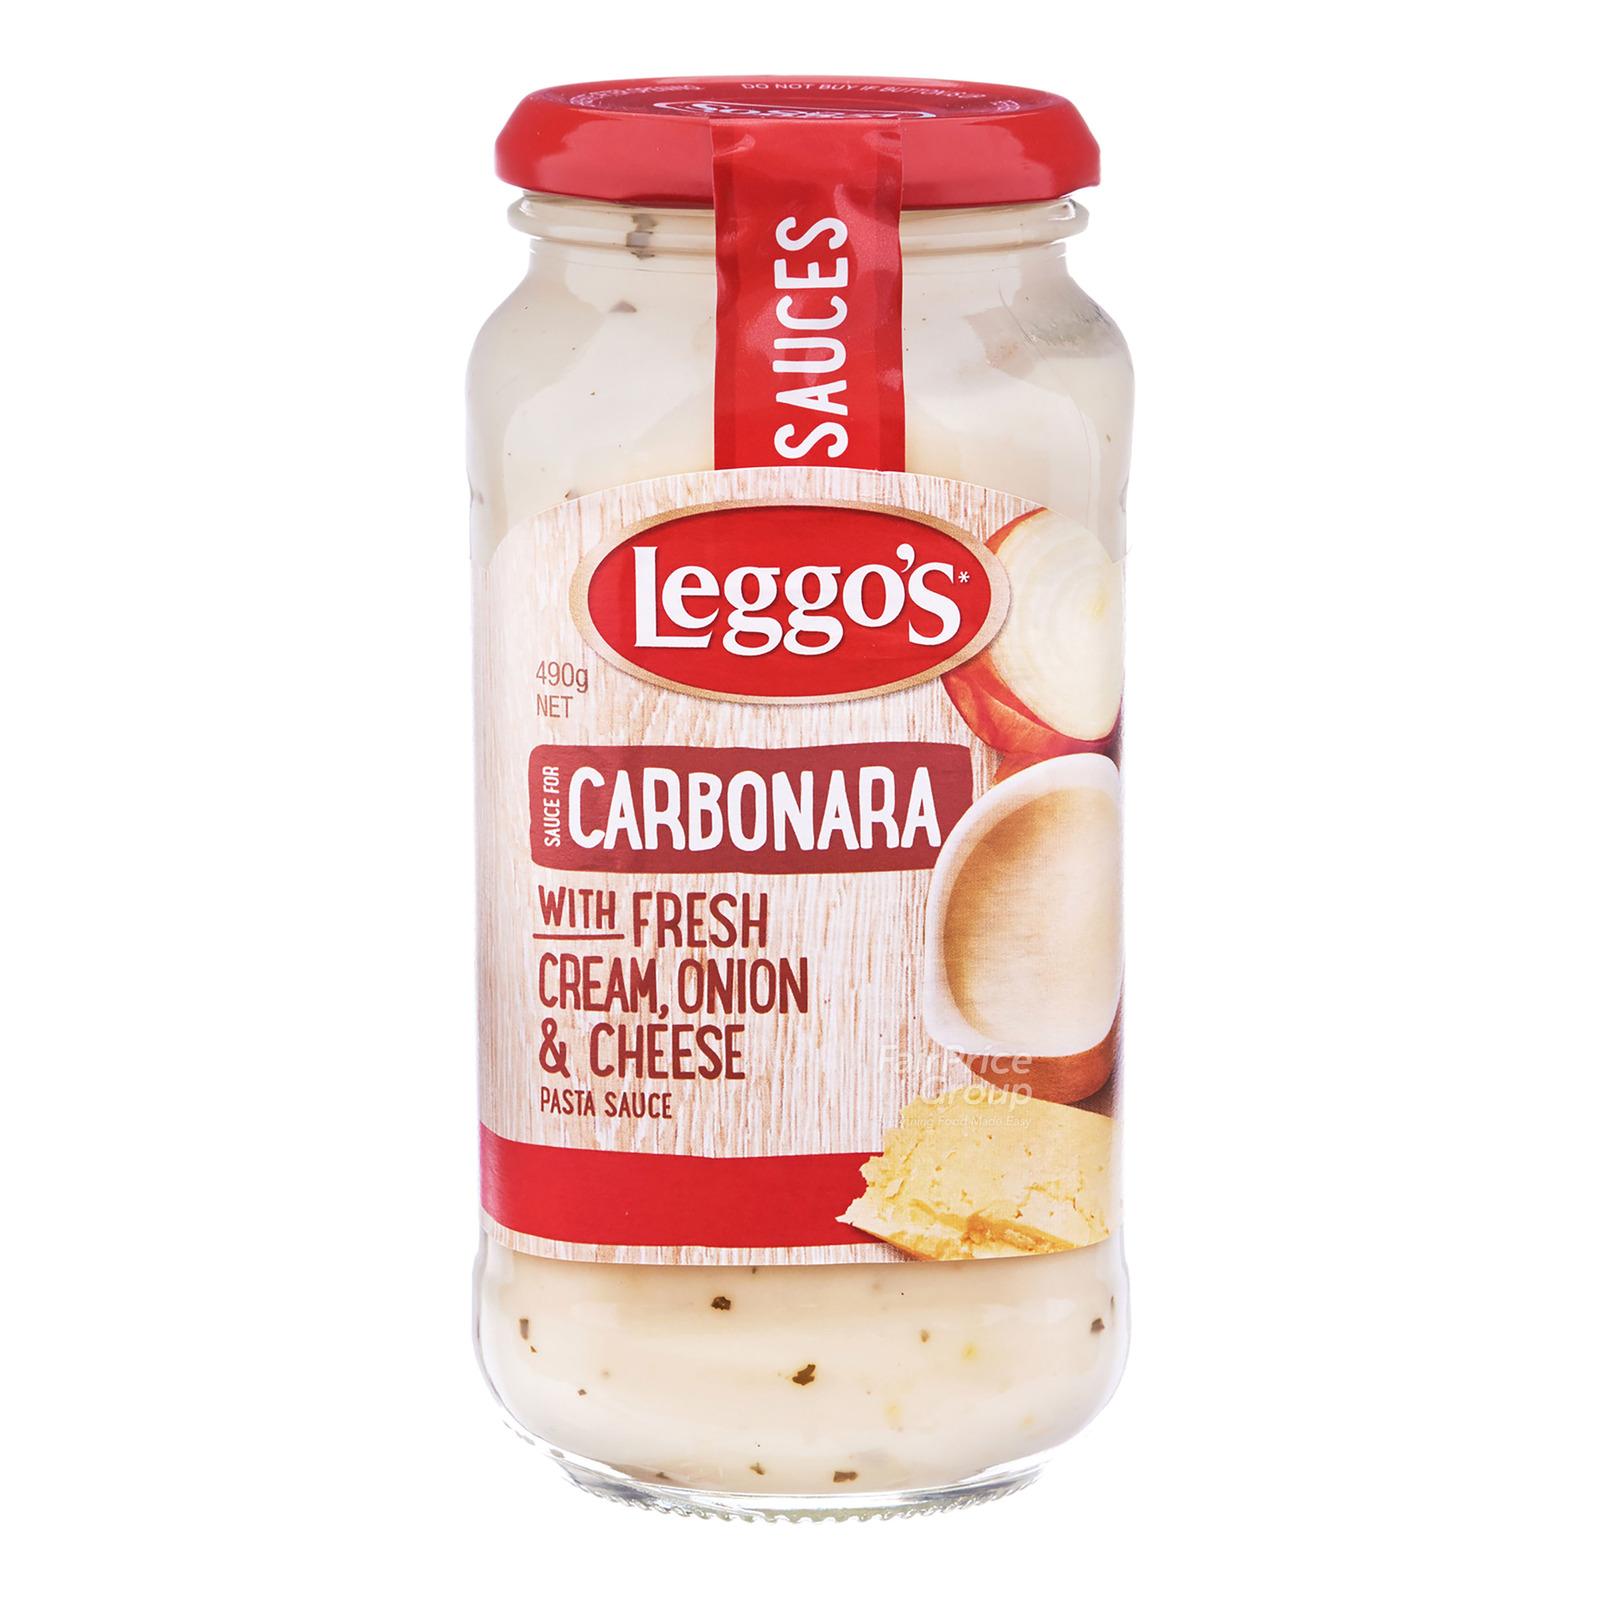 Leggo's Pasta Sauce - Carbonara (Fresh Cream, Onion & Cheese)